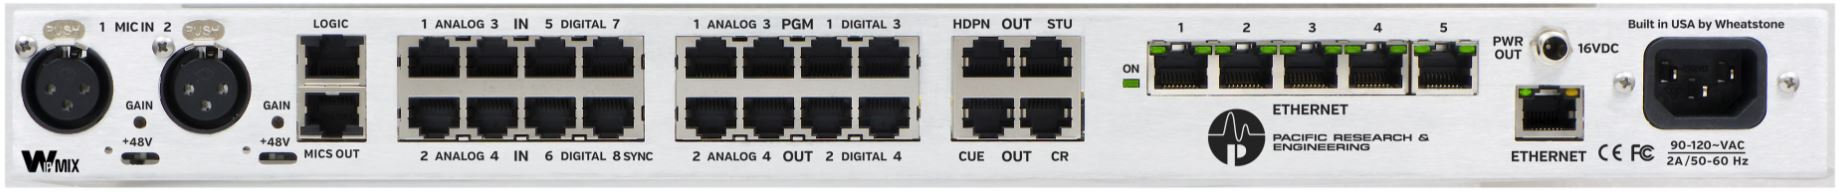 hight resolution of dmx ethernet wiring diagram